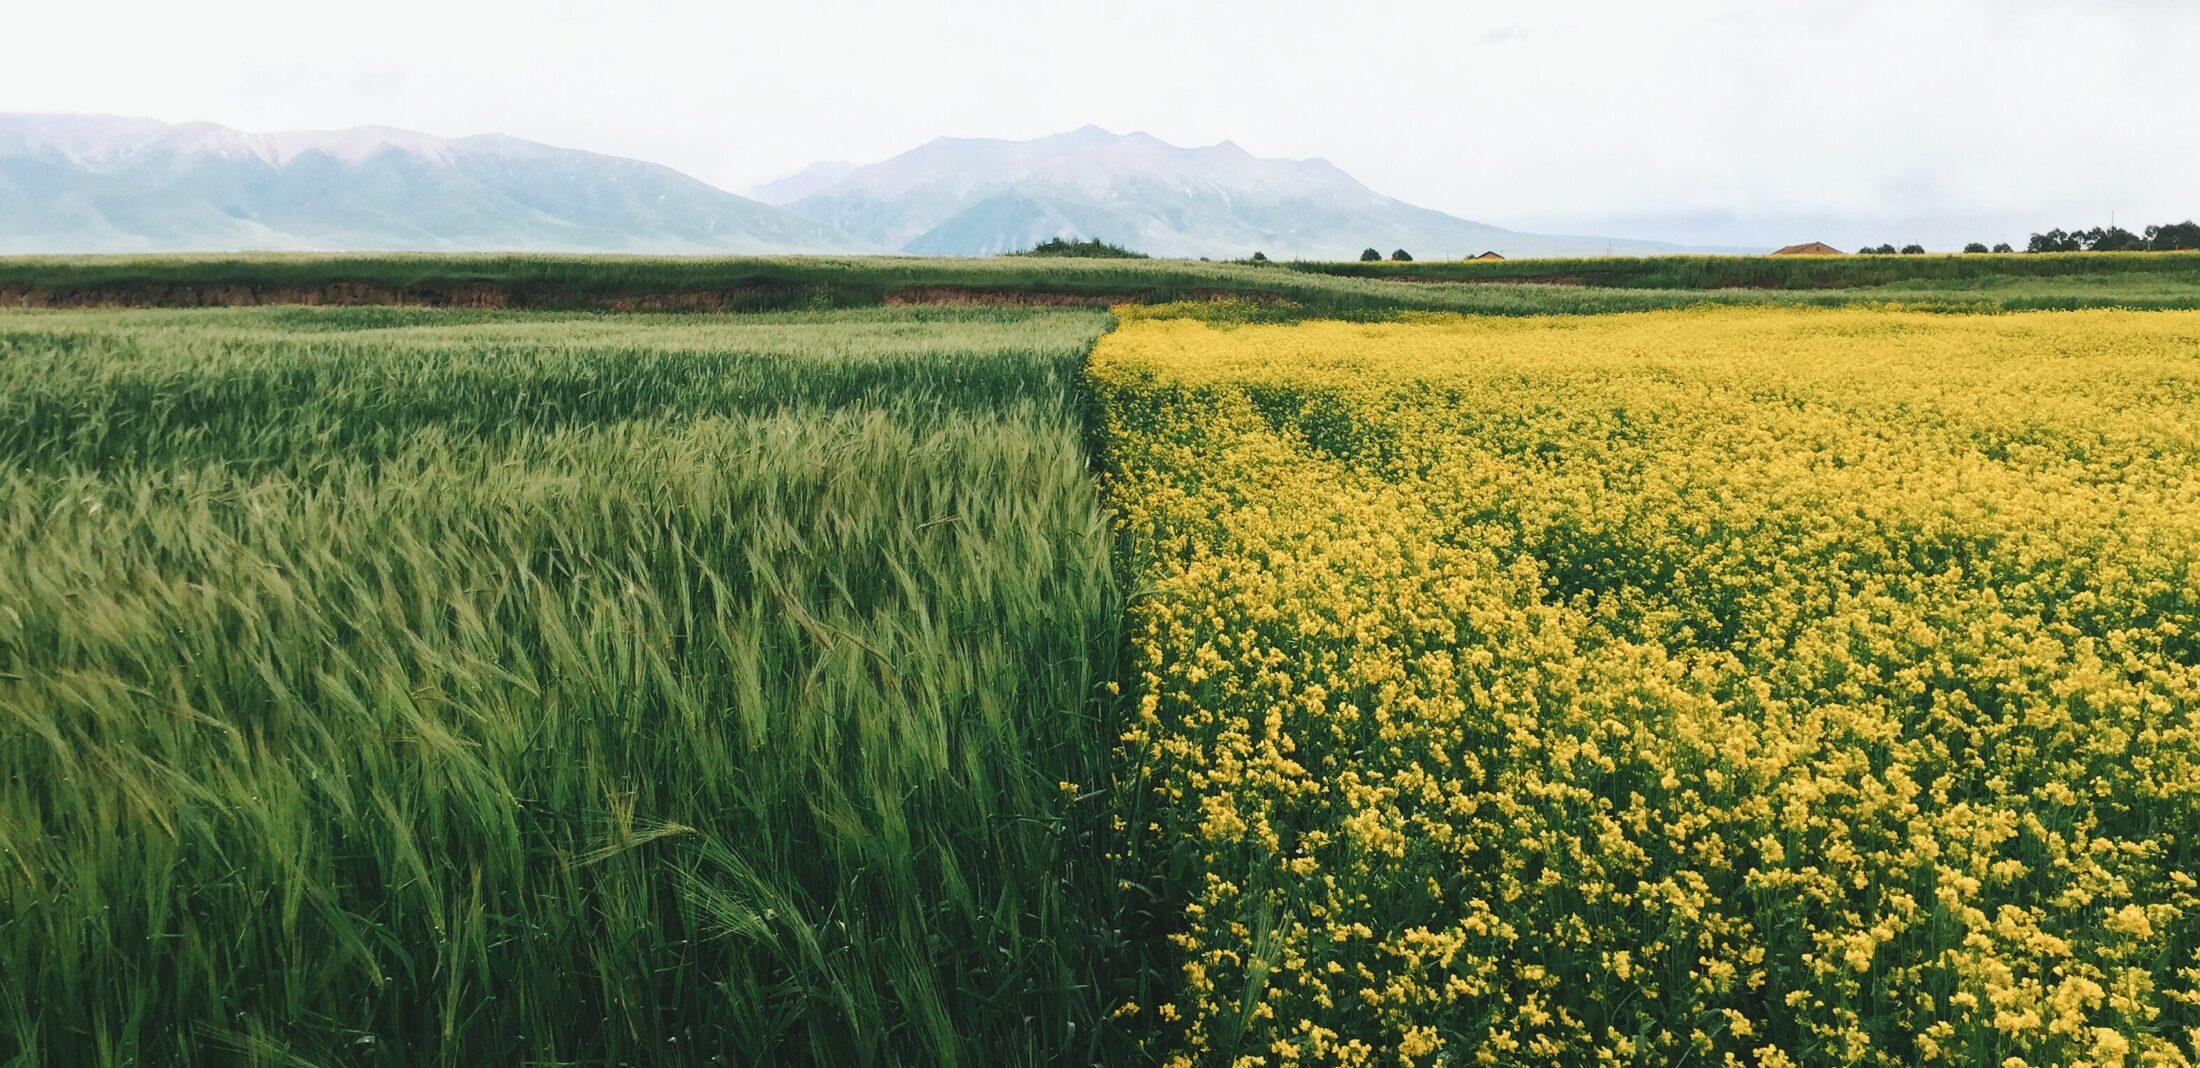 farm-insurance-crop-insurance-hemp insurance, hemp crop insurance